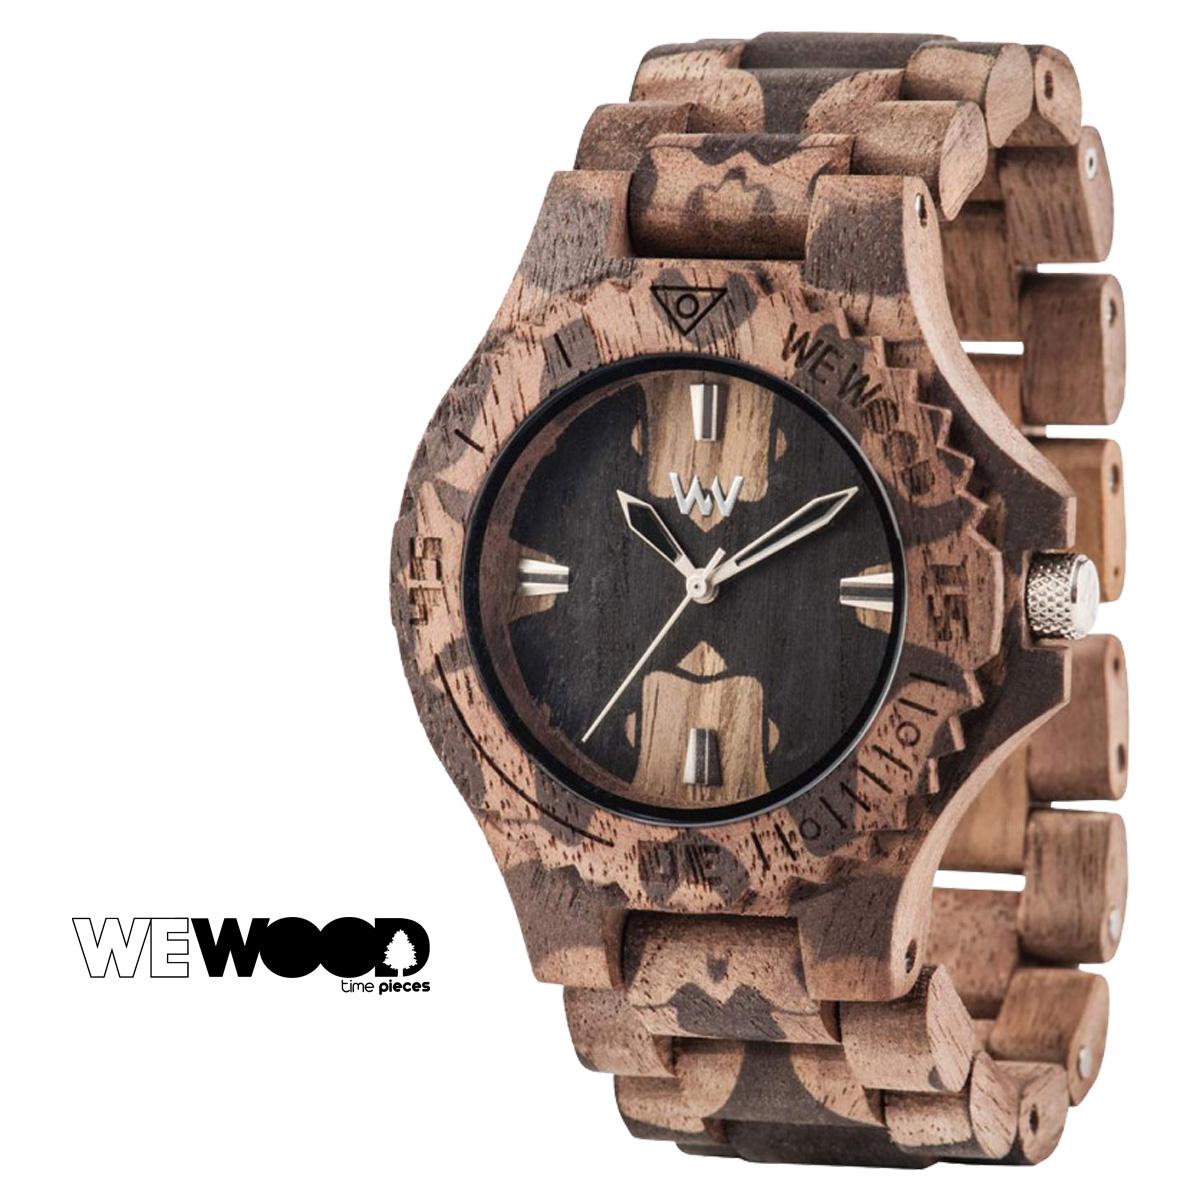 WEWOOD 腕時計 レディース ウィーウッド DATE NATURE MIRROR NUT メンズ